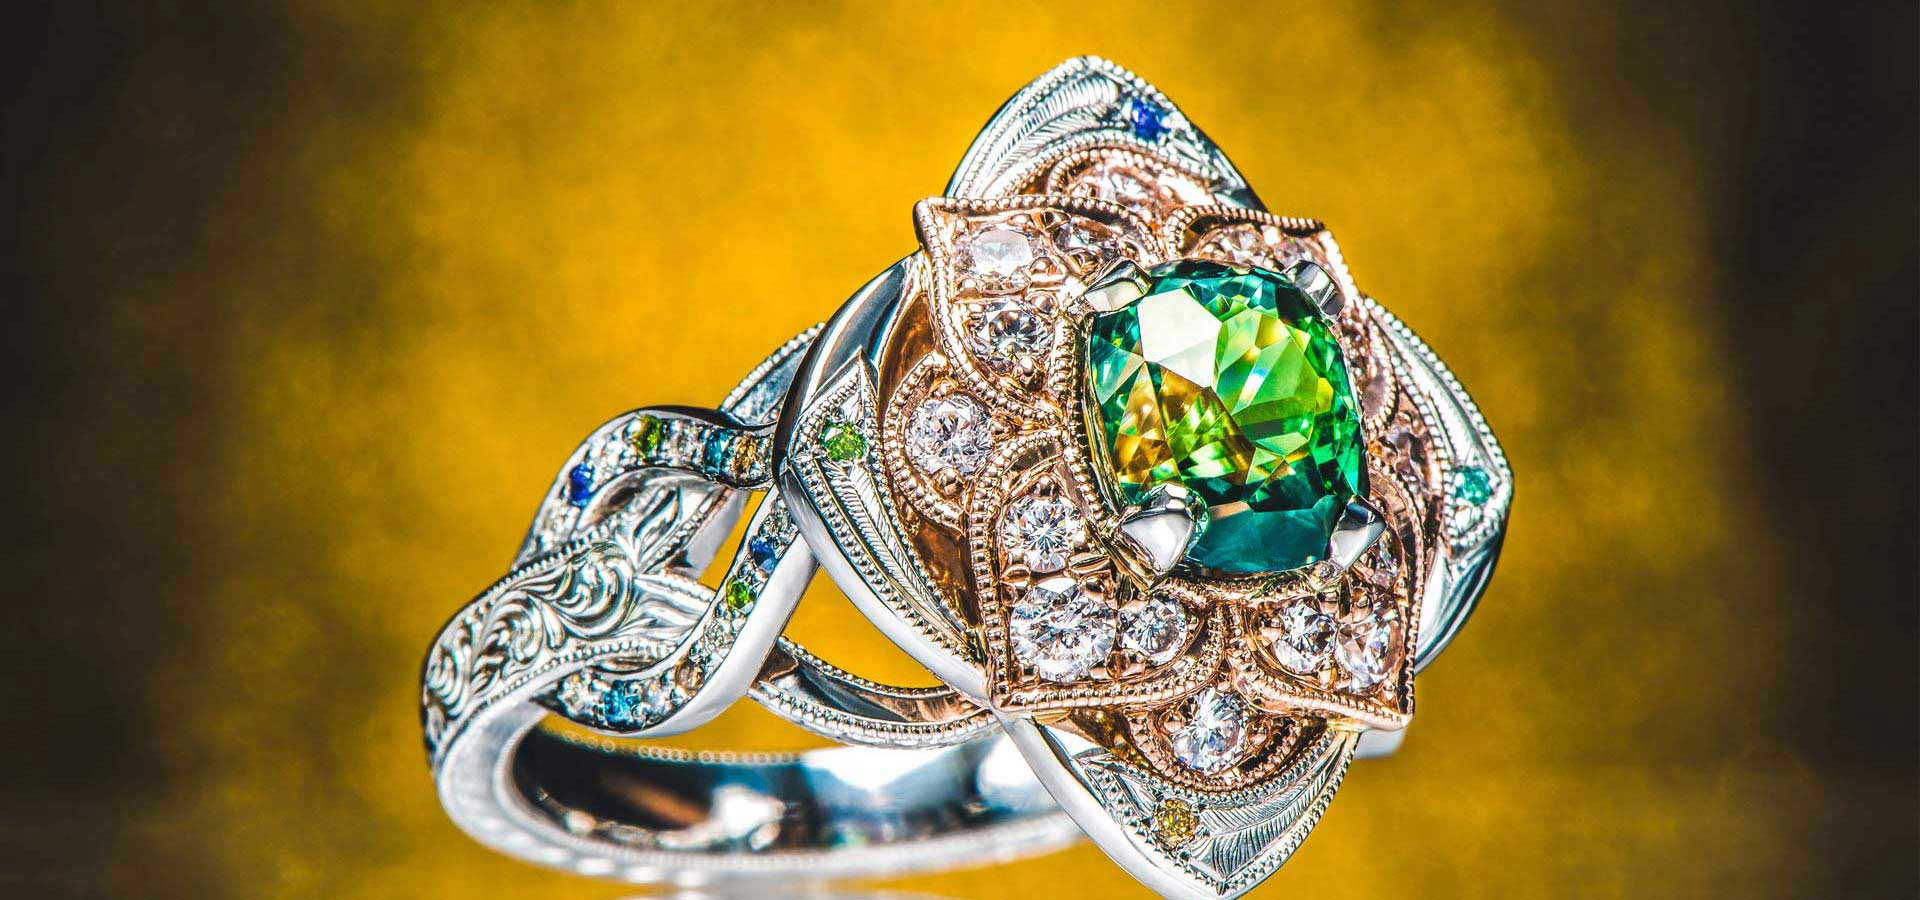 custom engagement rings AMrsiXTPXVhTbdAhJn bjBHNM unique wedding rings Most Unique Engagement Rings Wwwimgarcadecom Online Image Arcade Start